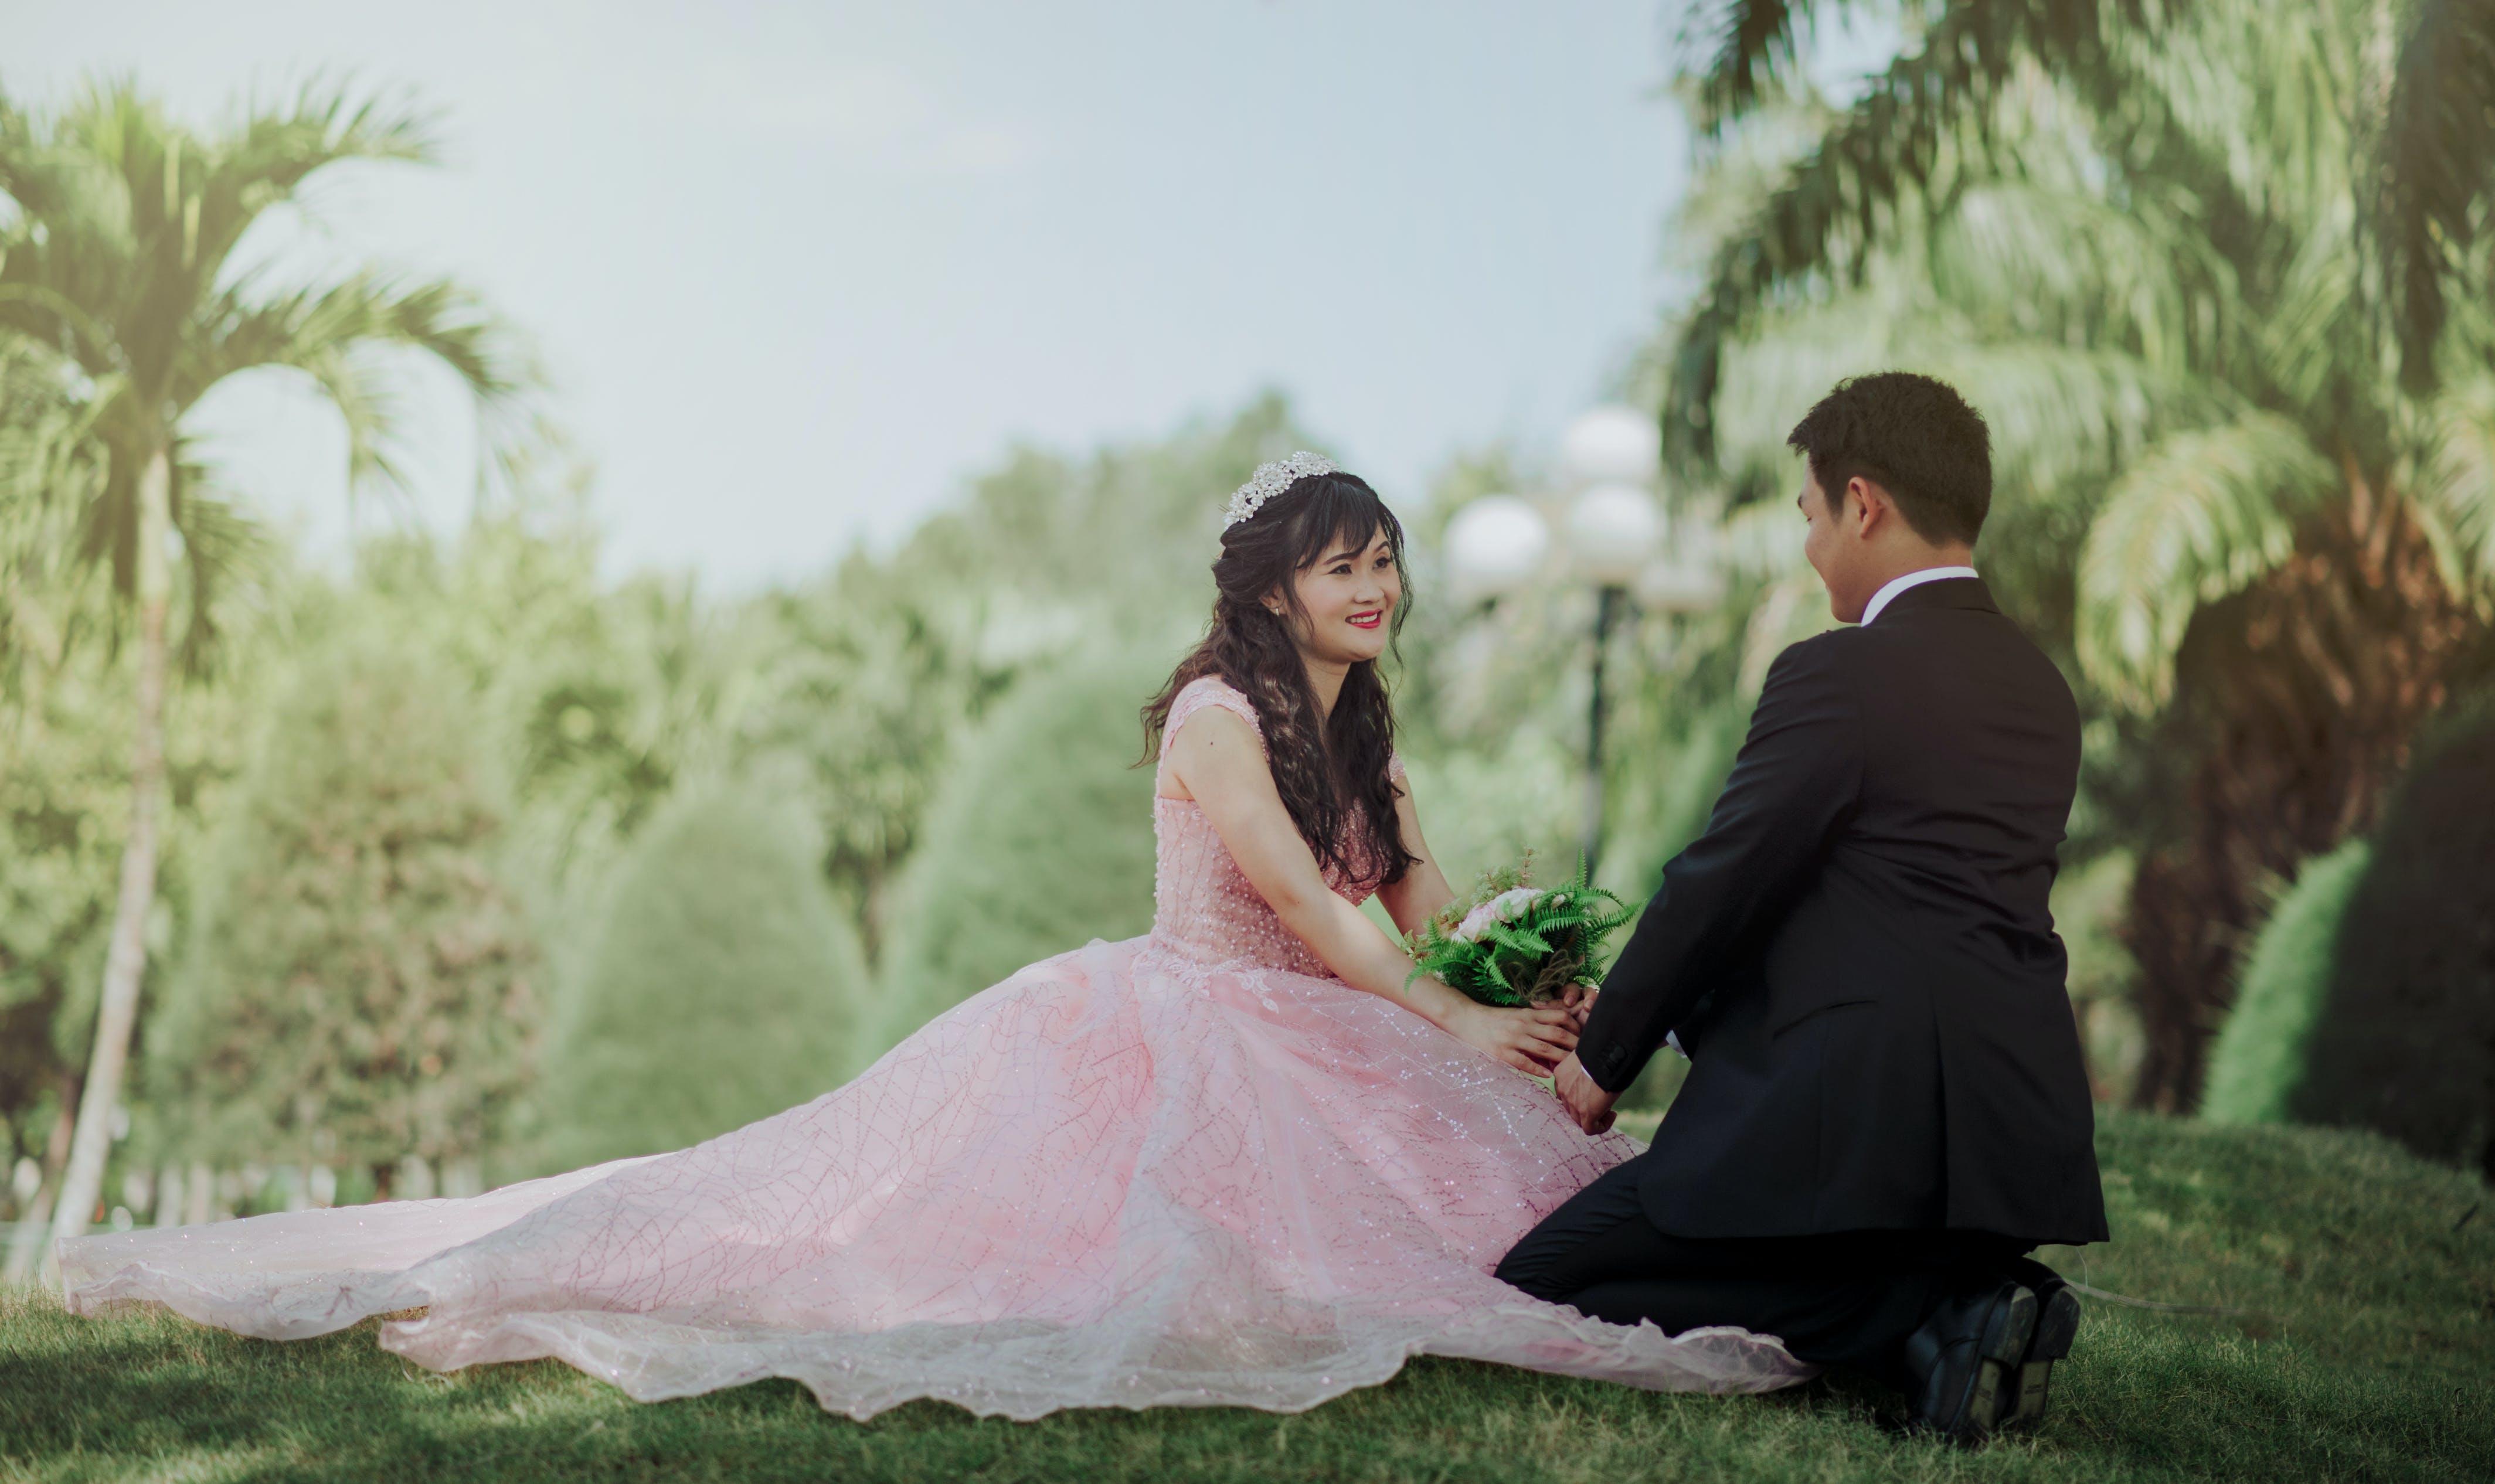 Couple Sitting on Grass